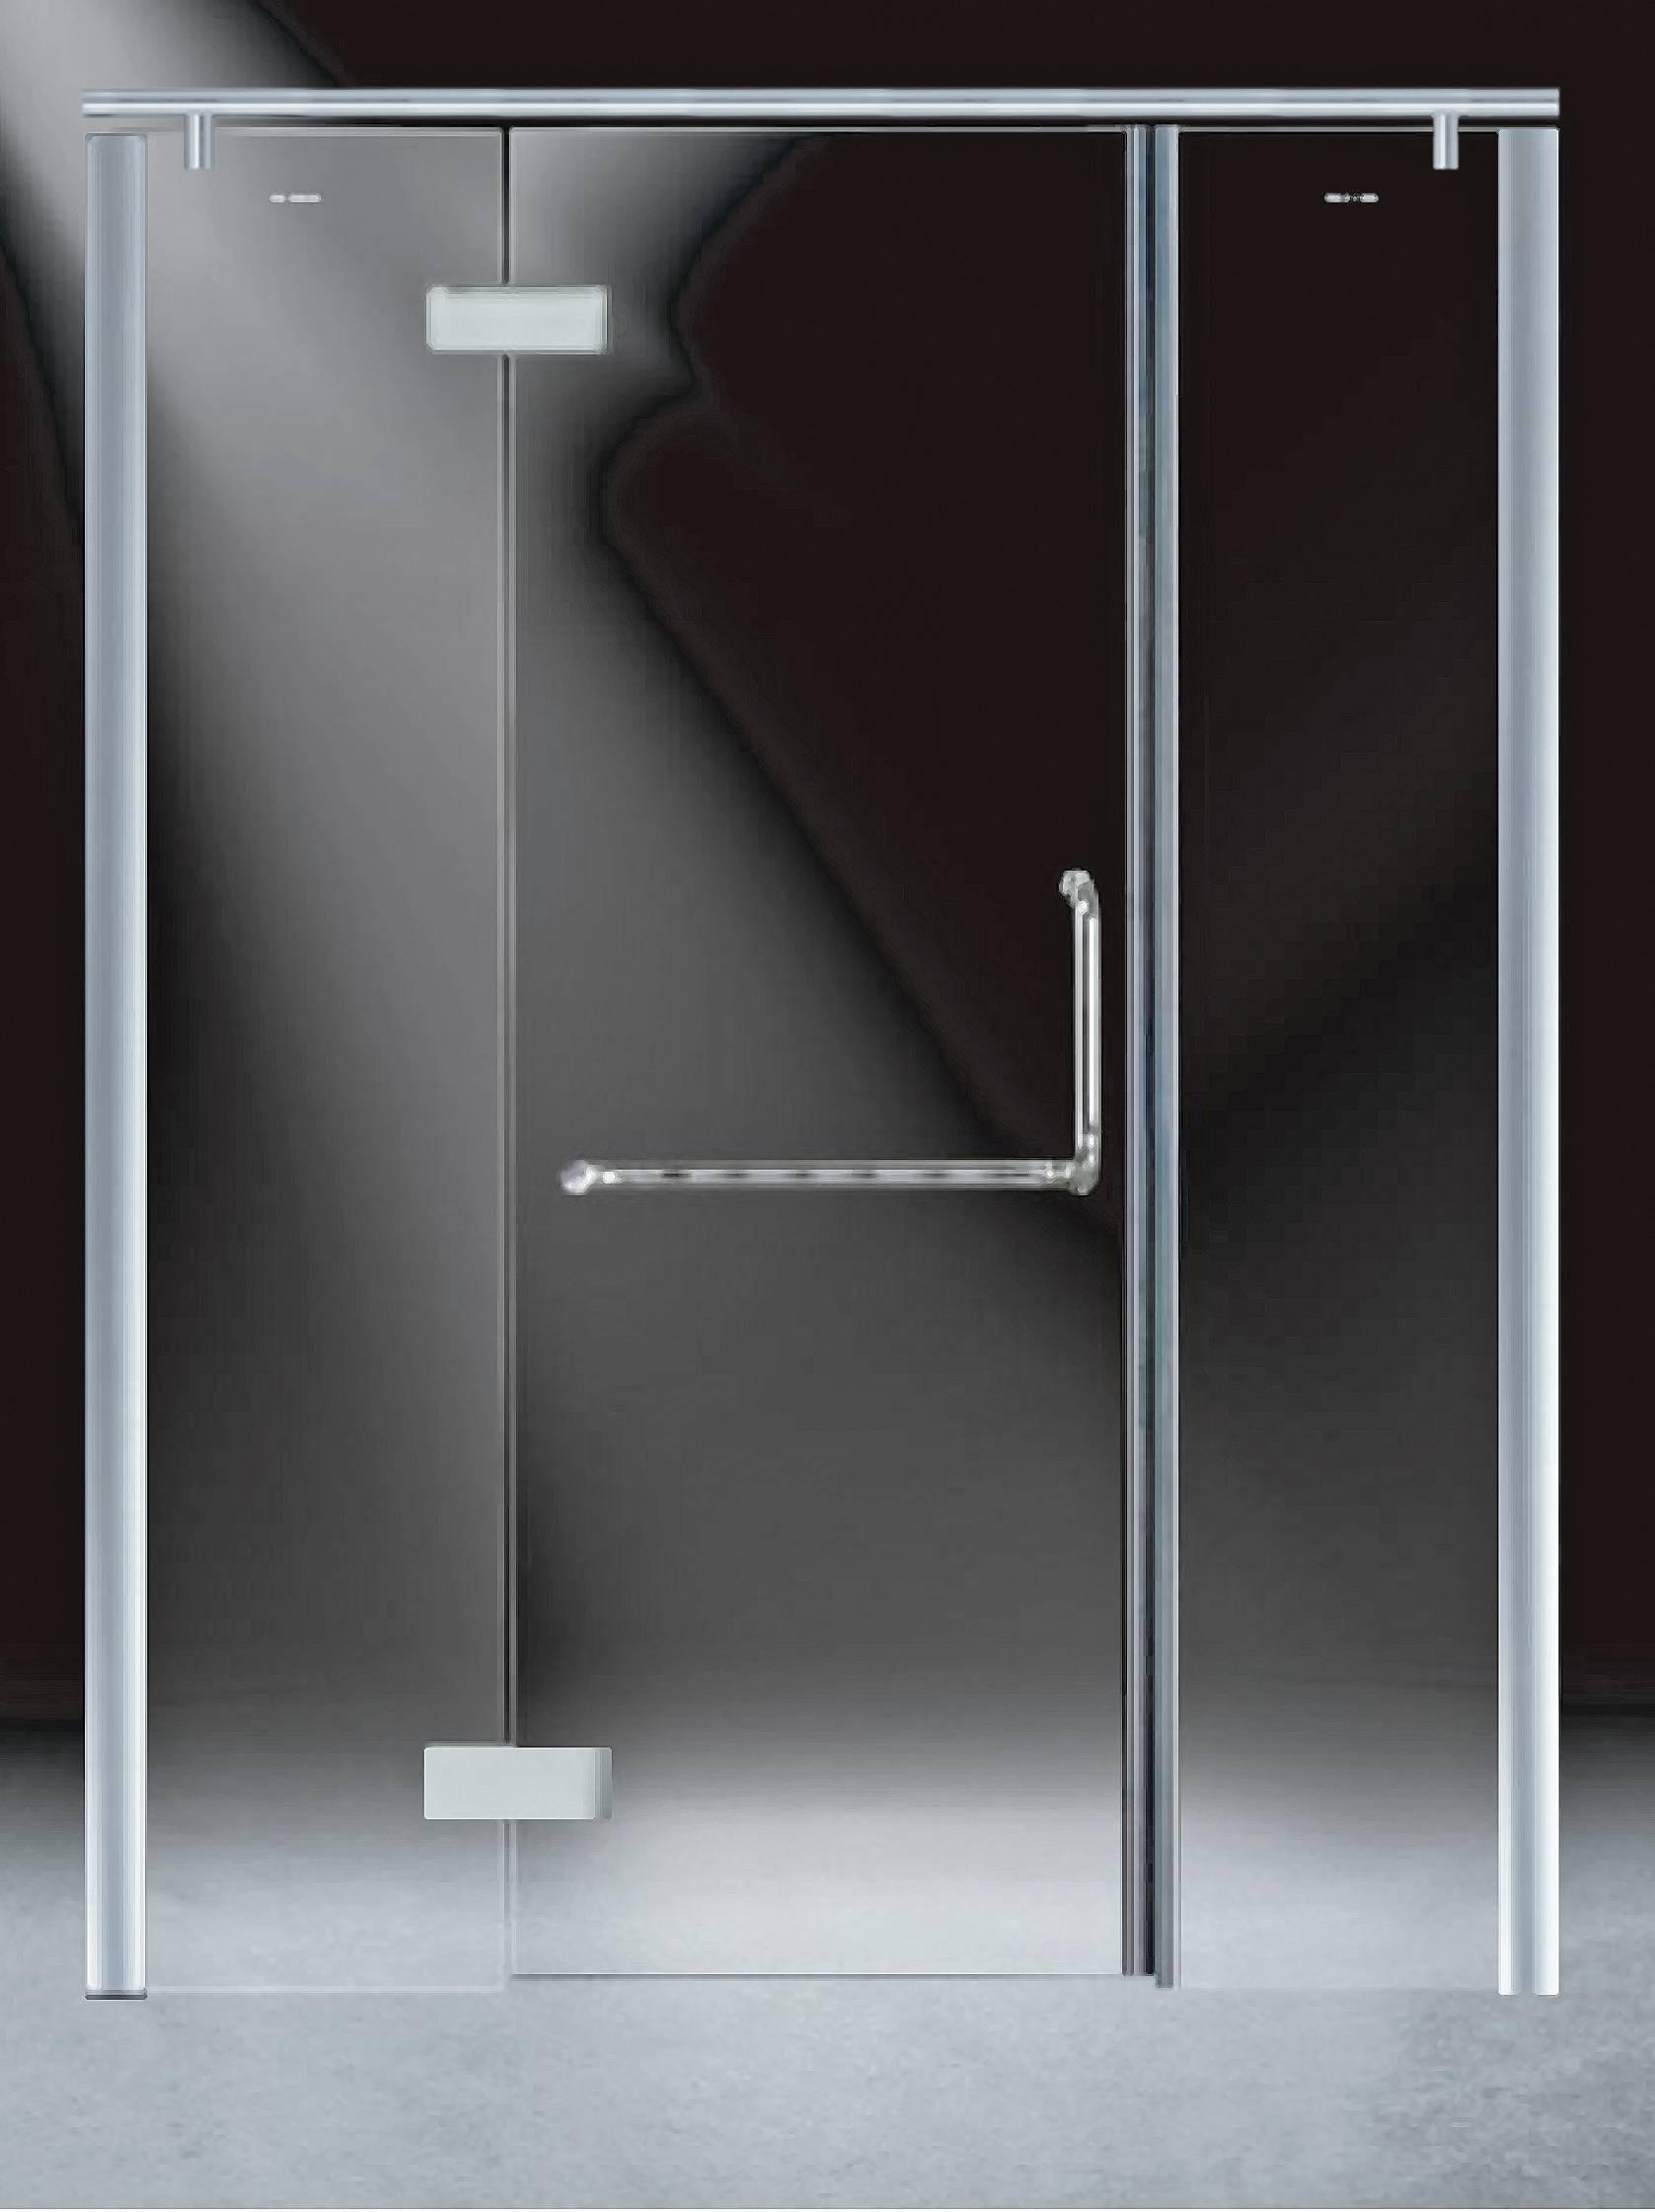 Puertas Para Regadera Baño:Detalles DEL PRODUCTO CANCEL A PARED DFW43